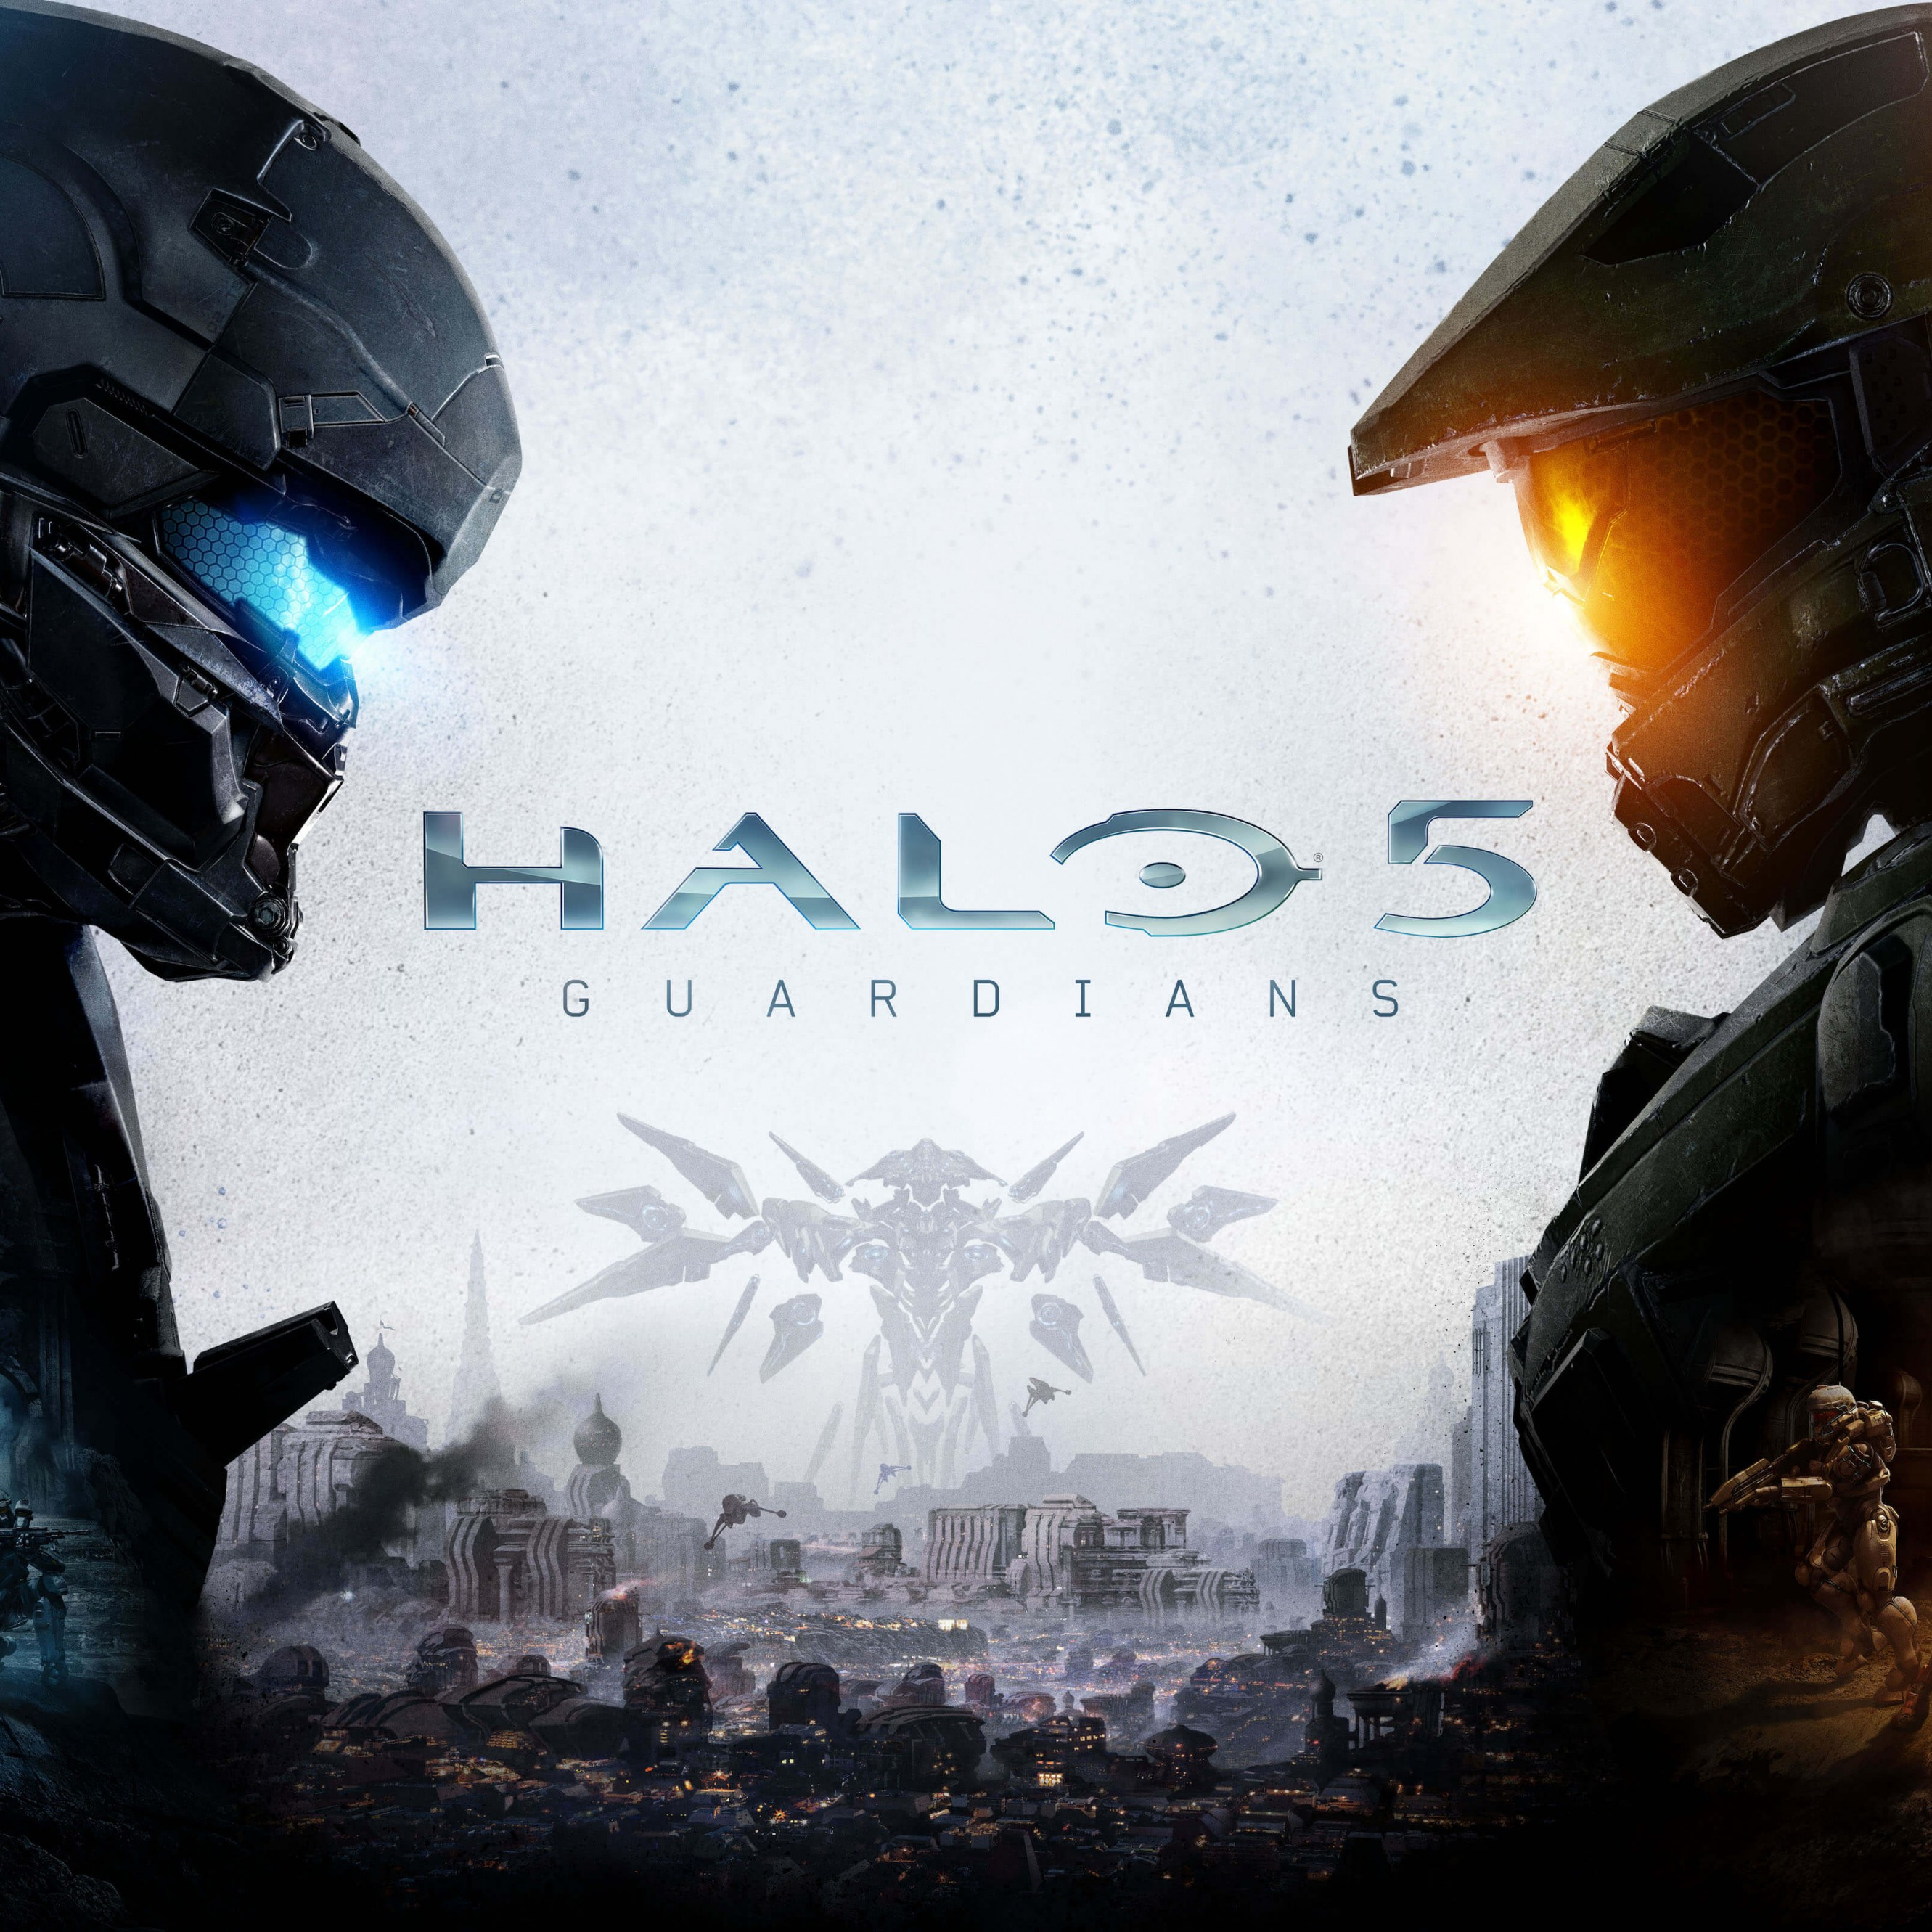 Halo Live Wallpaper: Halo 5 Mobile Wallpaper